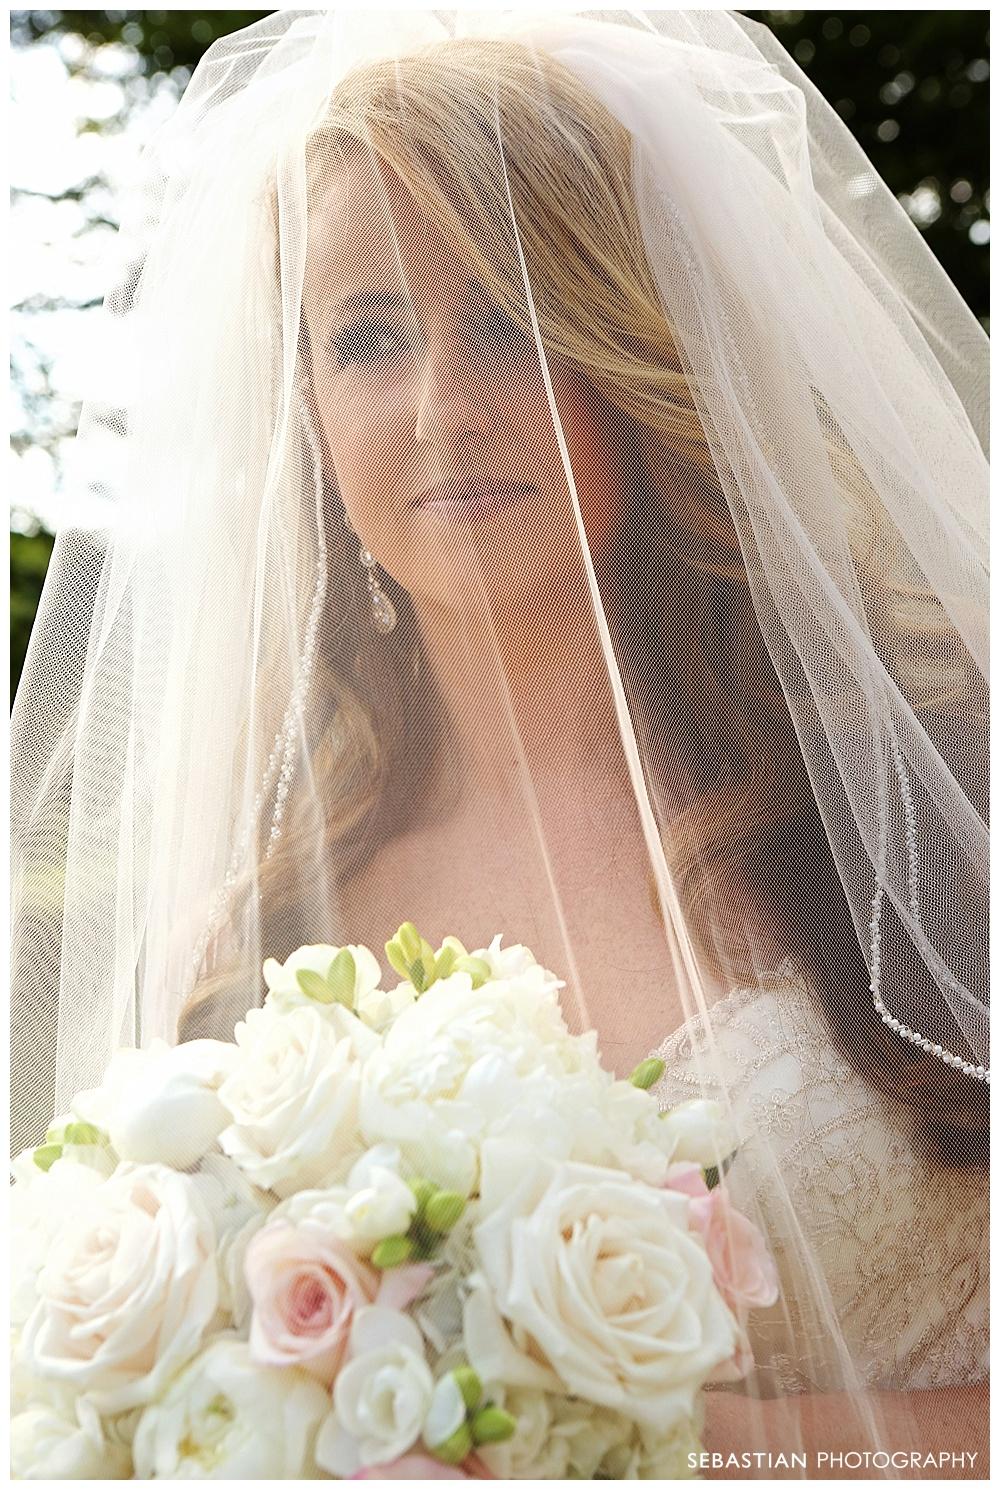 CT Wedding Photographer_Sebastian Photography_Lake of Isles_Outdoor Wedding_Murray_Bransford1014.jpg